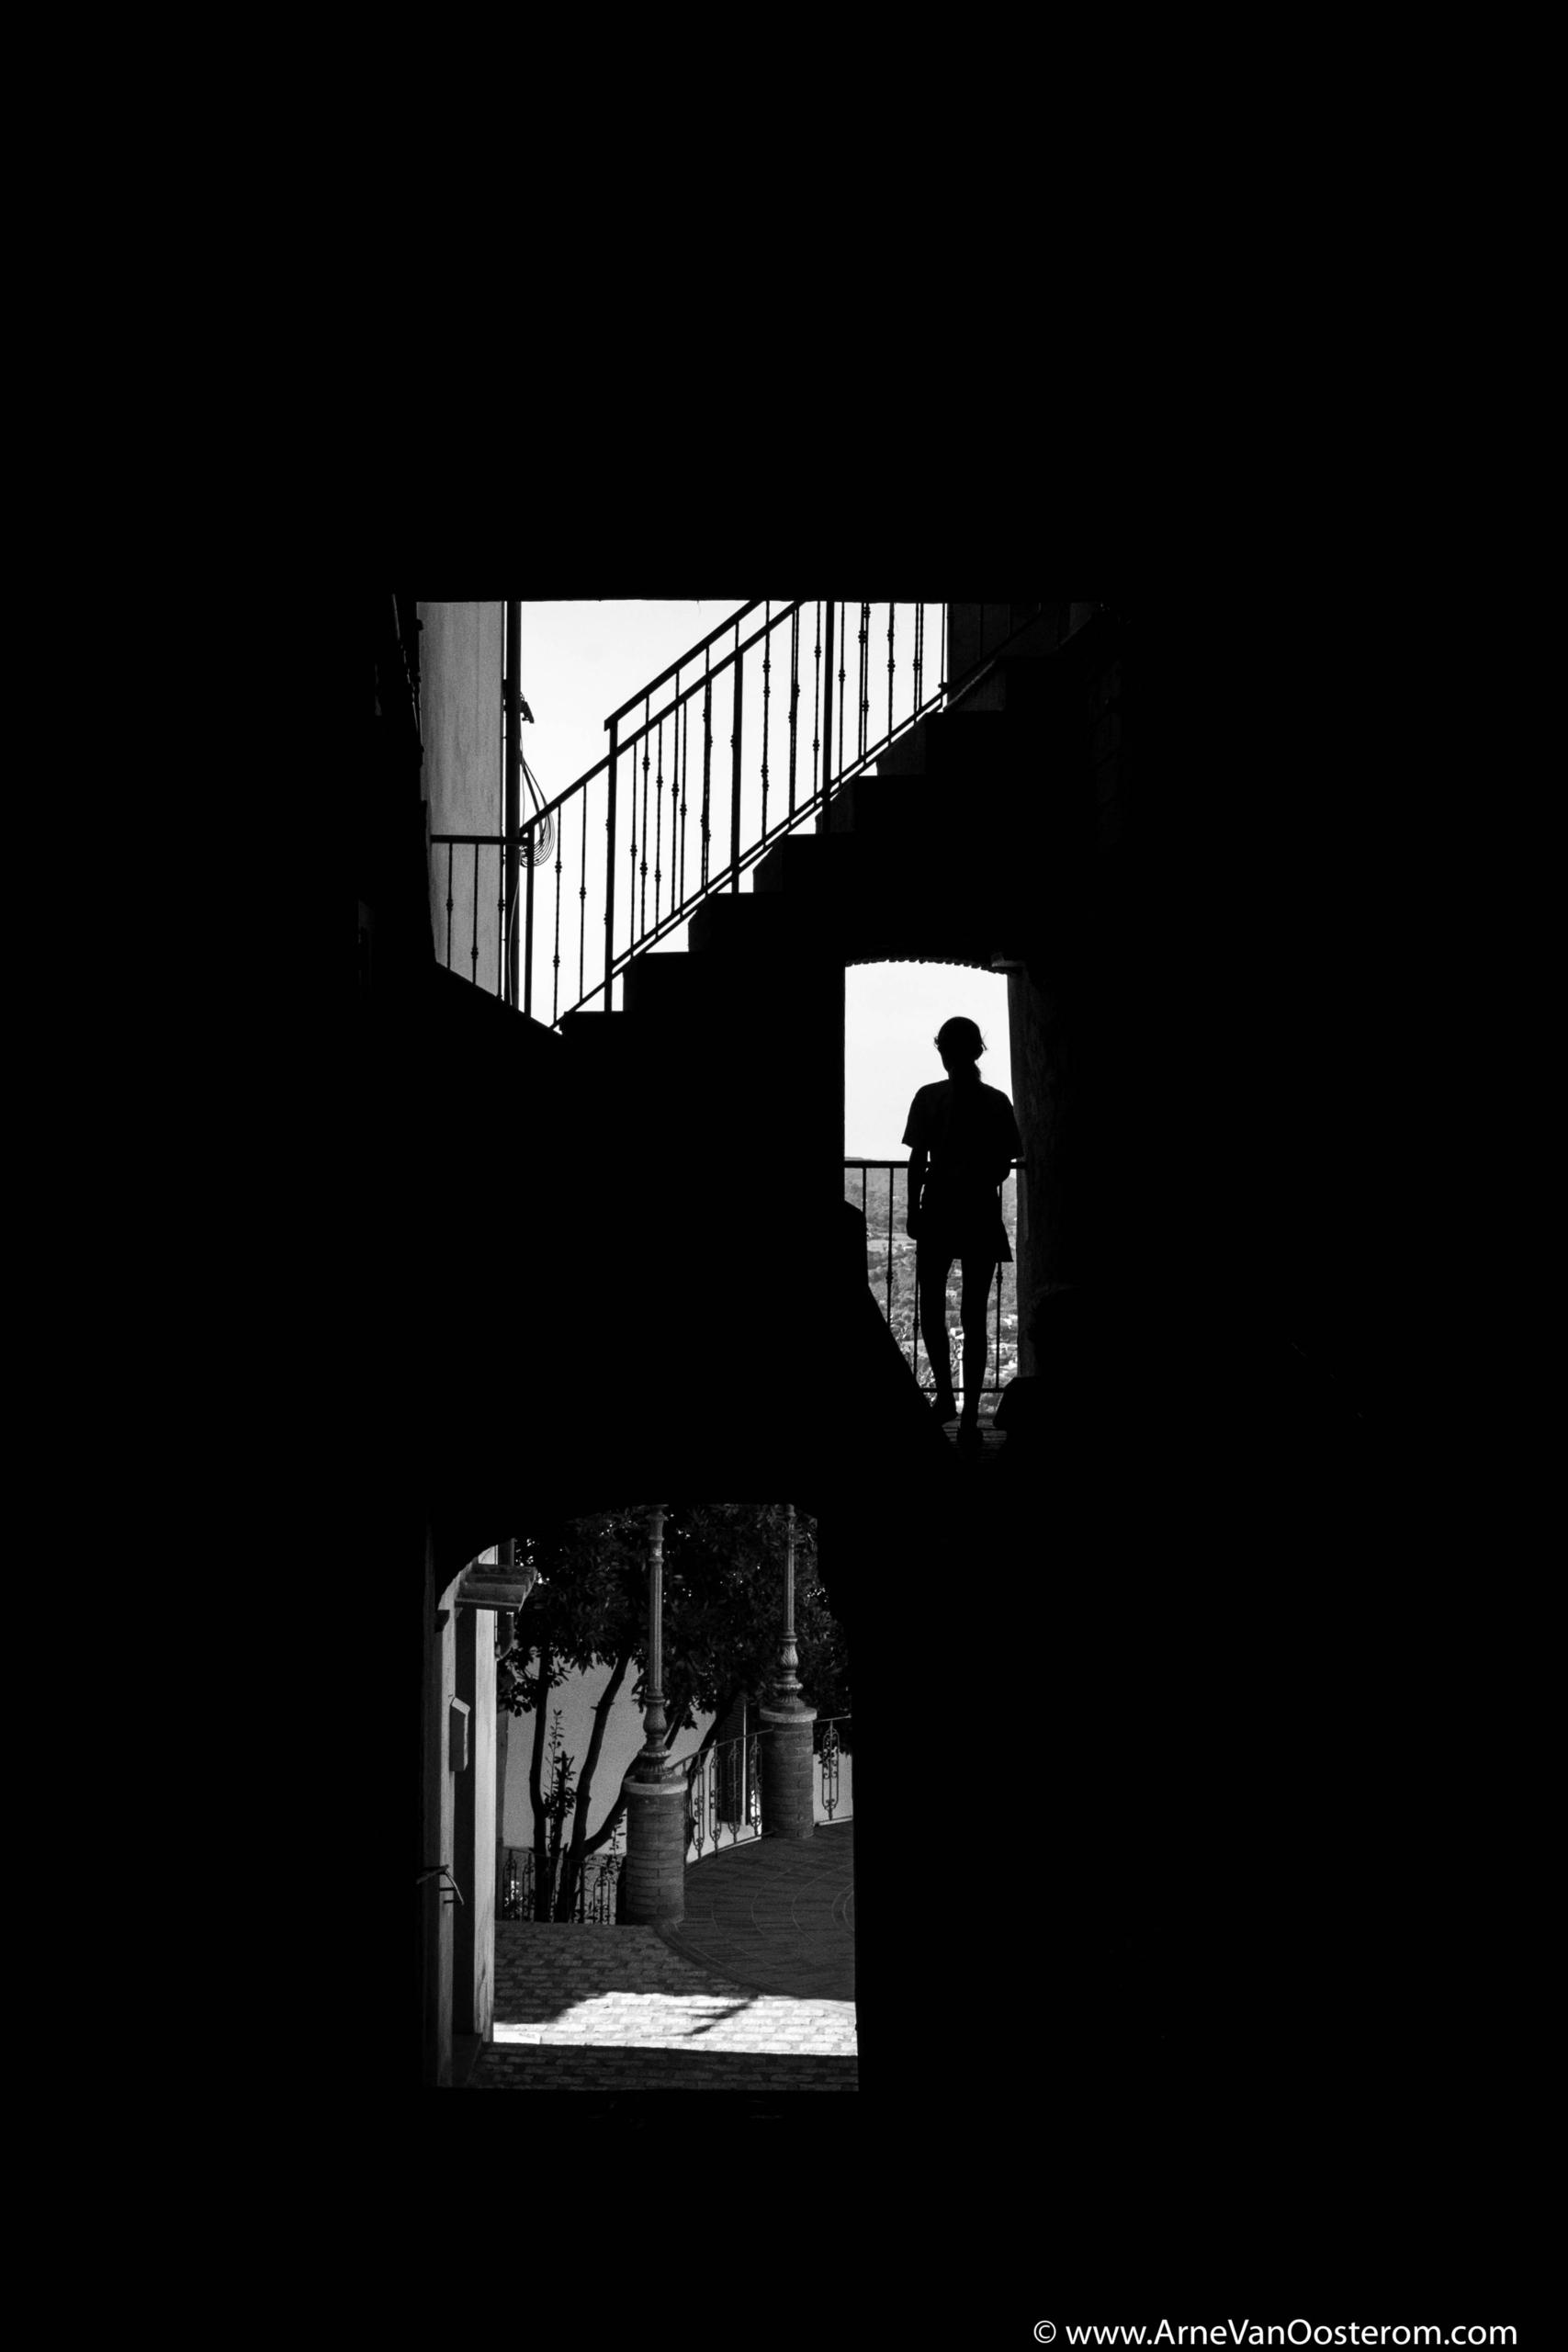 Elba, BlackAndWhitePhotography - arnevanoosterom | ello